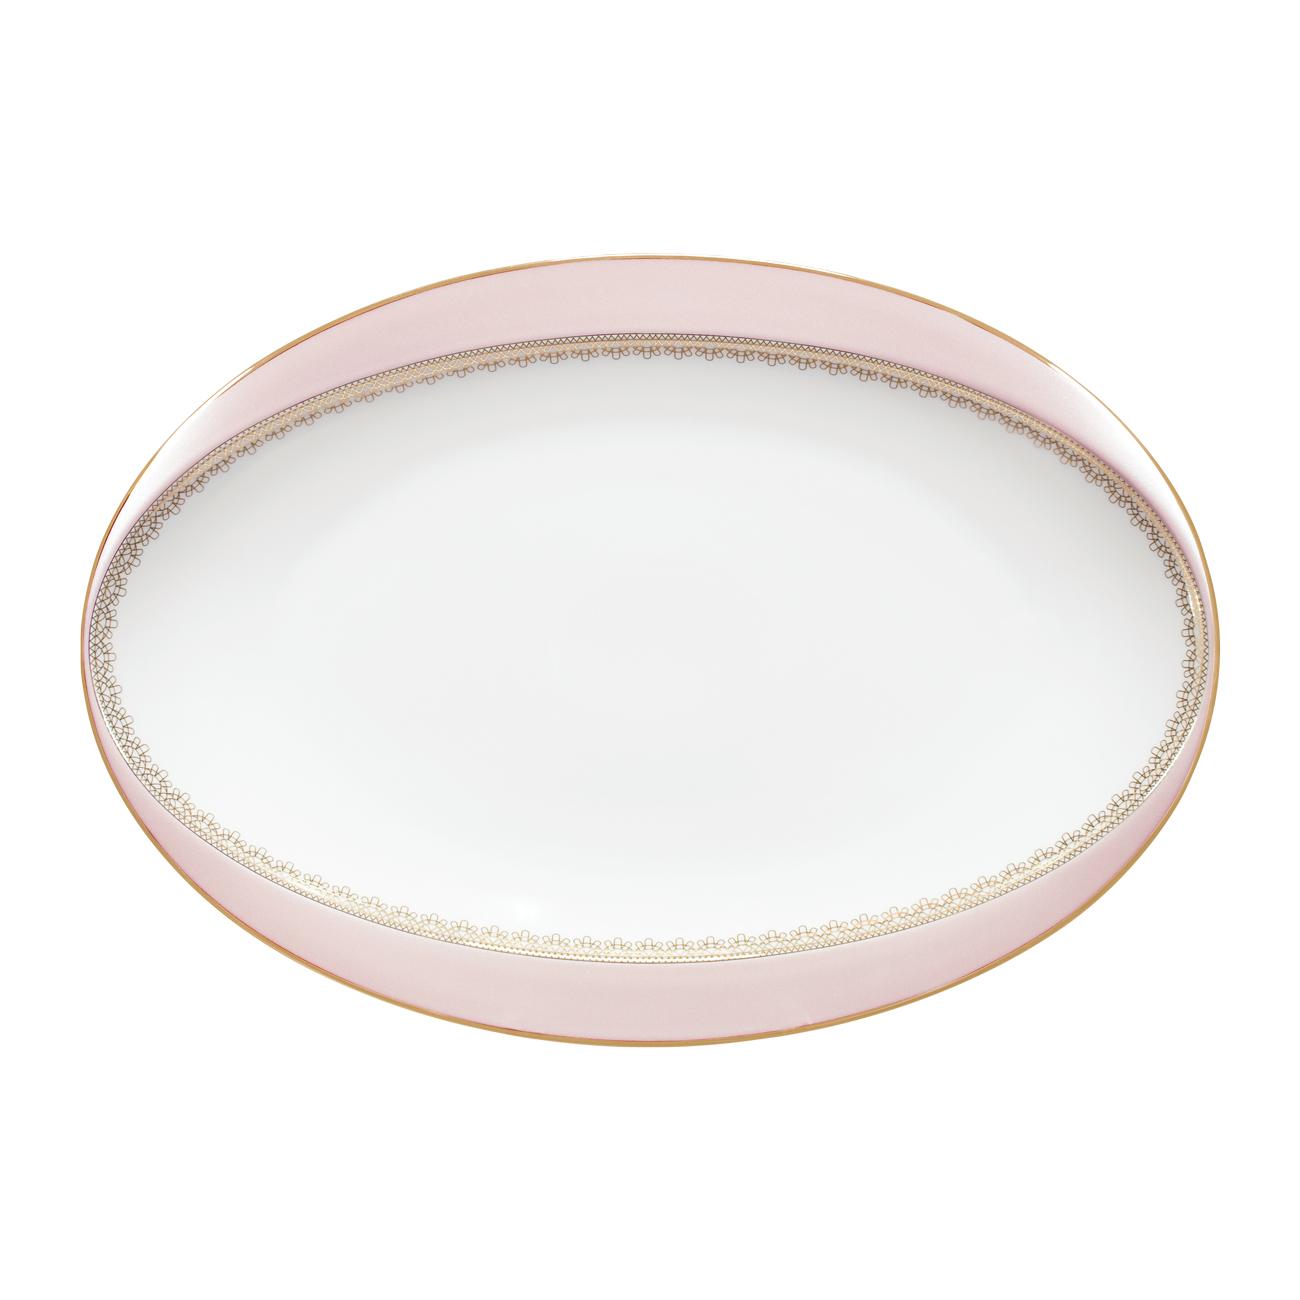 Travessa Oval 35cm Ballet 0